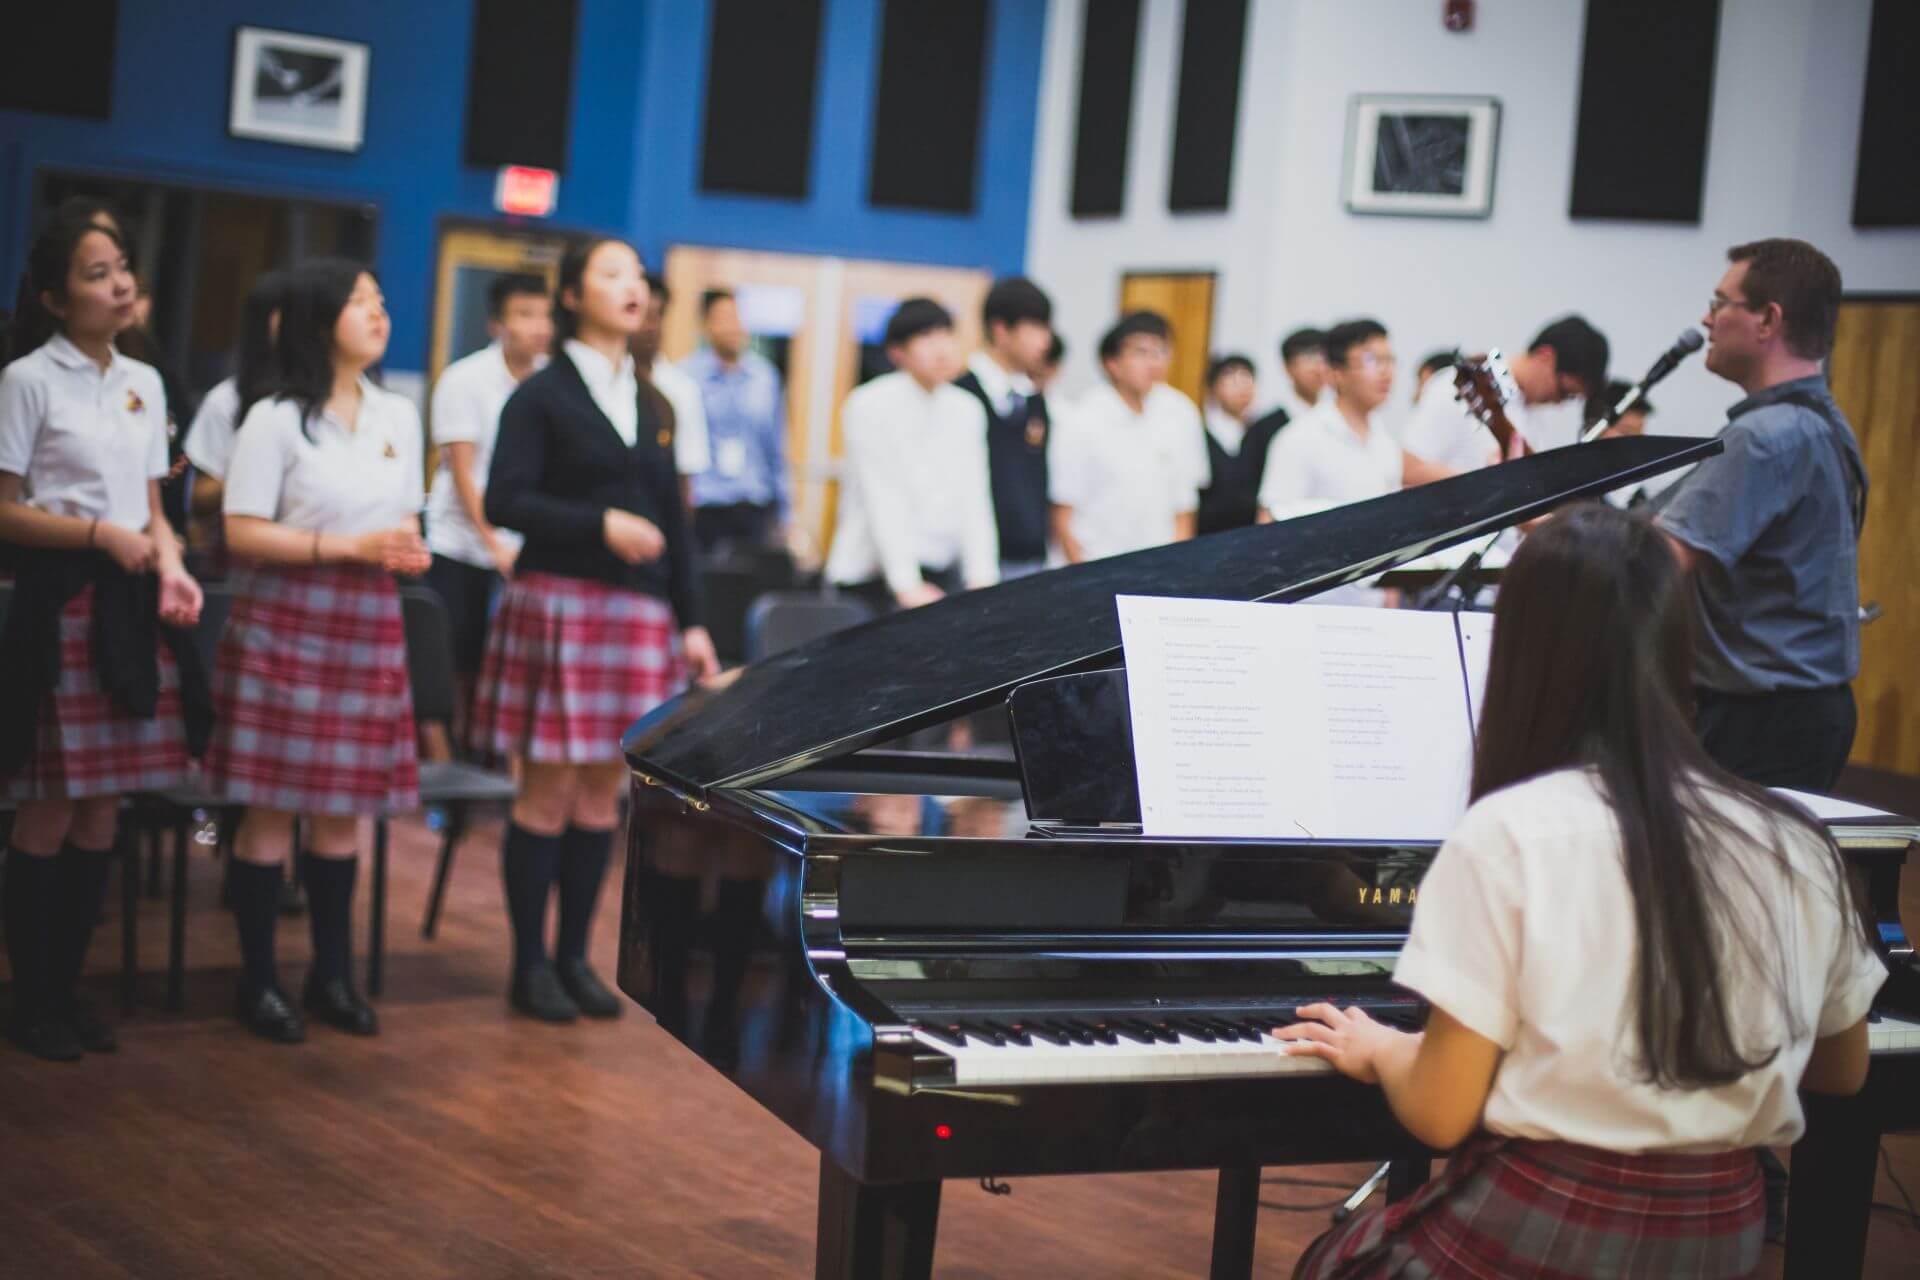 Regent Christian Academy